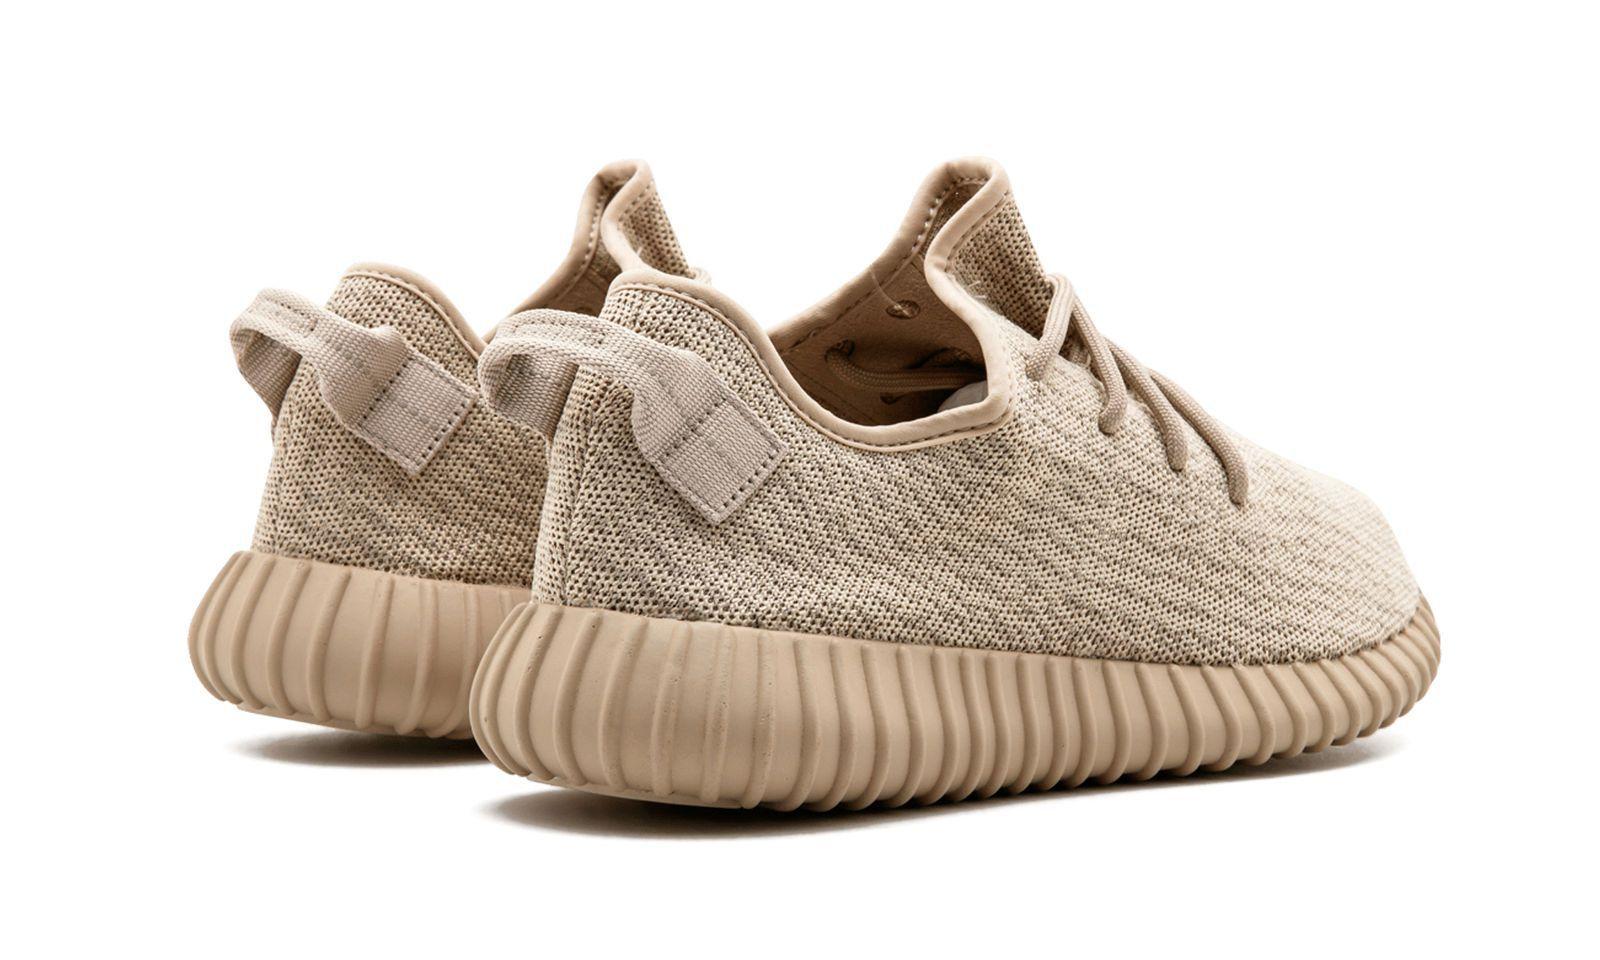 ae102e5a265ec Adidas Yeezy Boost 350 Oxford Tan Running Shoes - Buy Adidas Yeezy ...